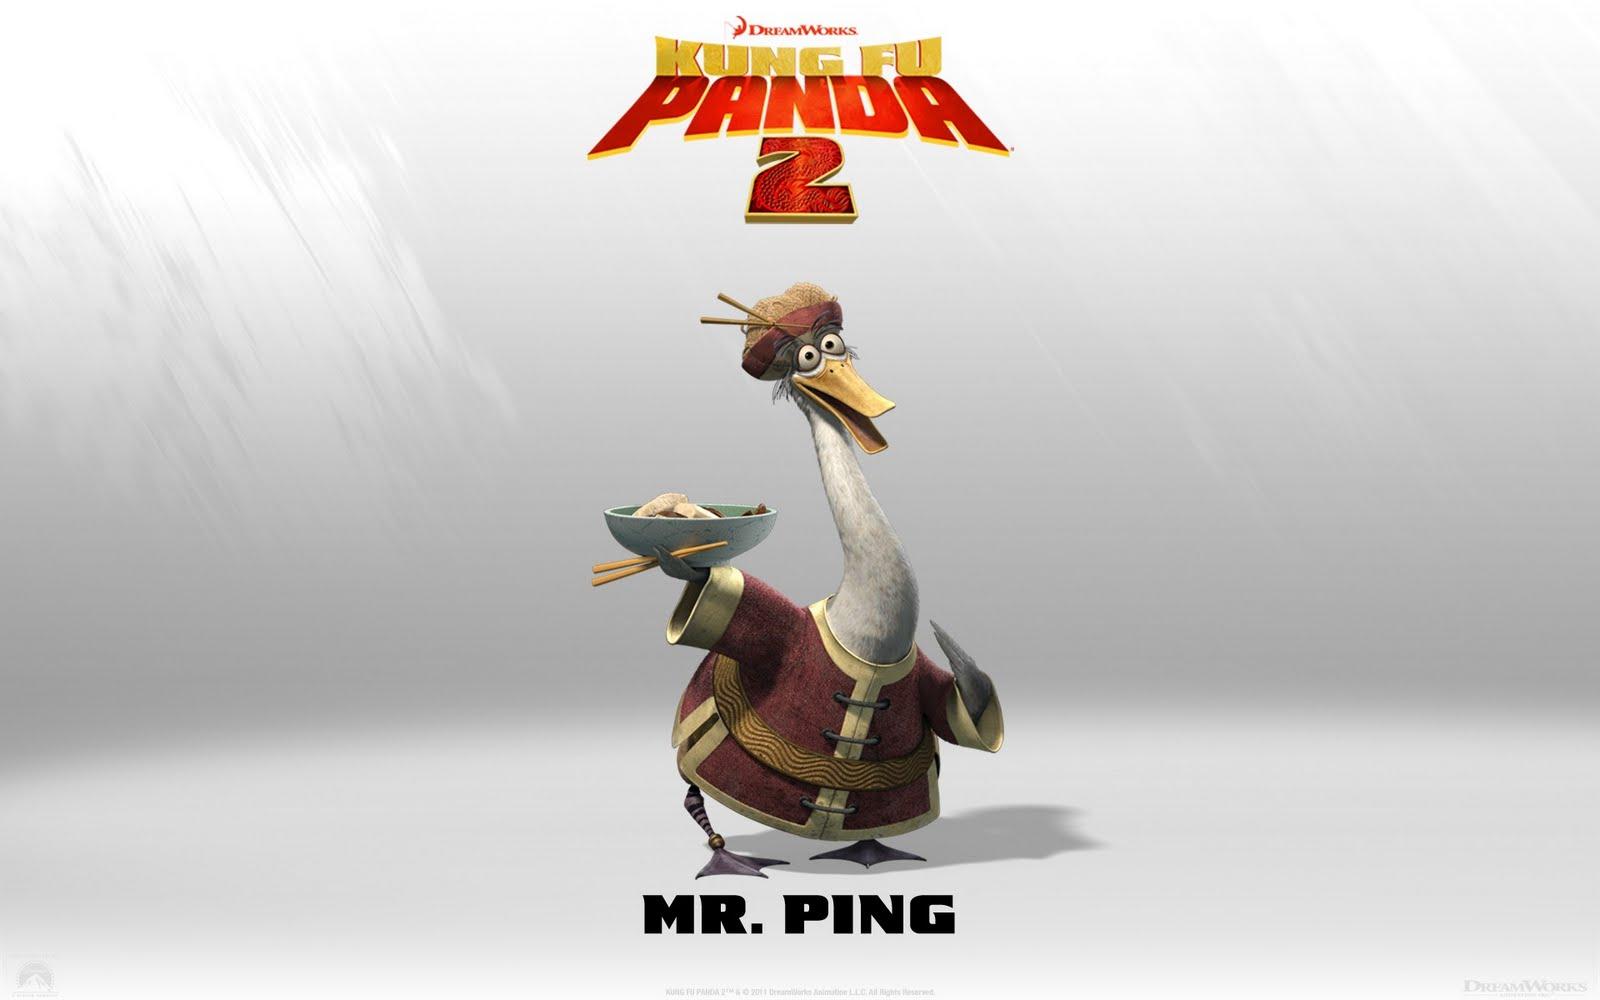 http://3.bp.blogspot.com/-uBKNljW-abs/Tdup-vMQ4VI/AAAAAAAACD0/AUPcmNIDnjI/s1600/Kung+Fu+Panda+2+Wallpaper+6.jpg